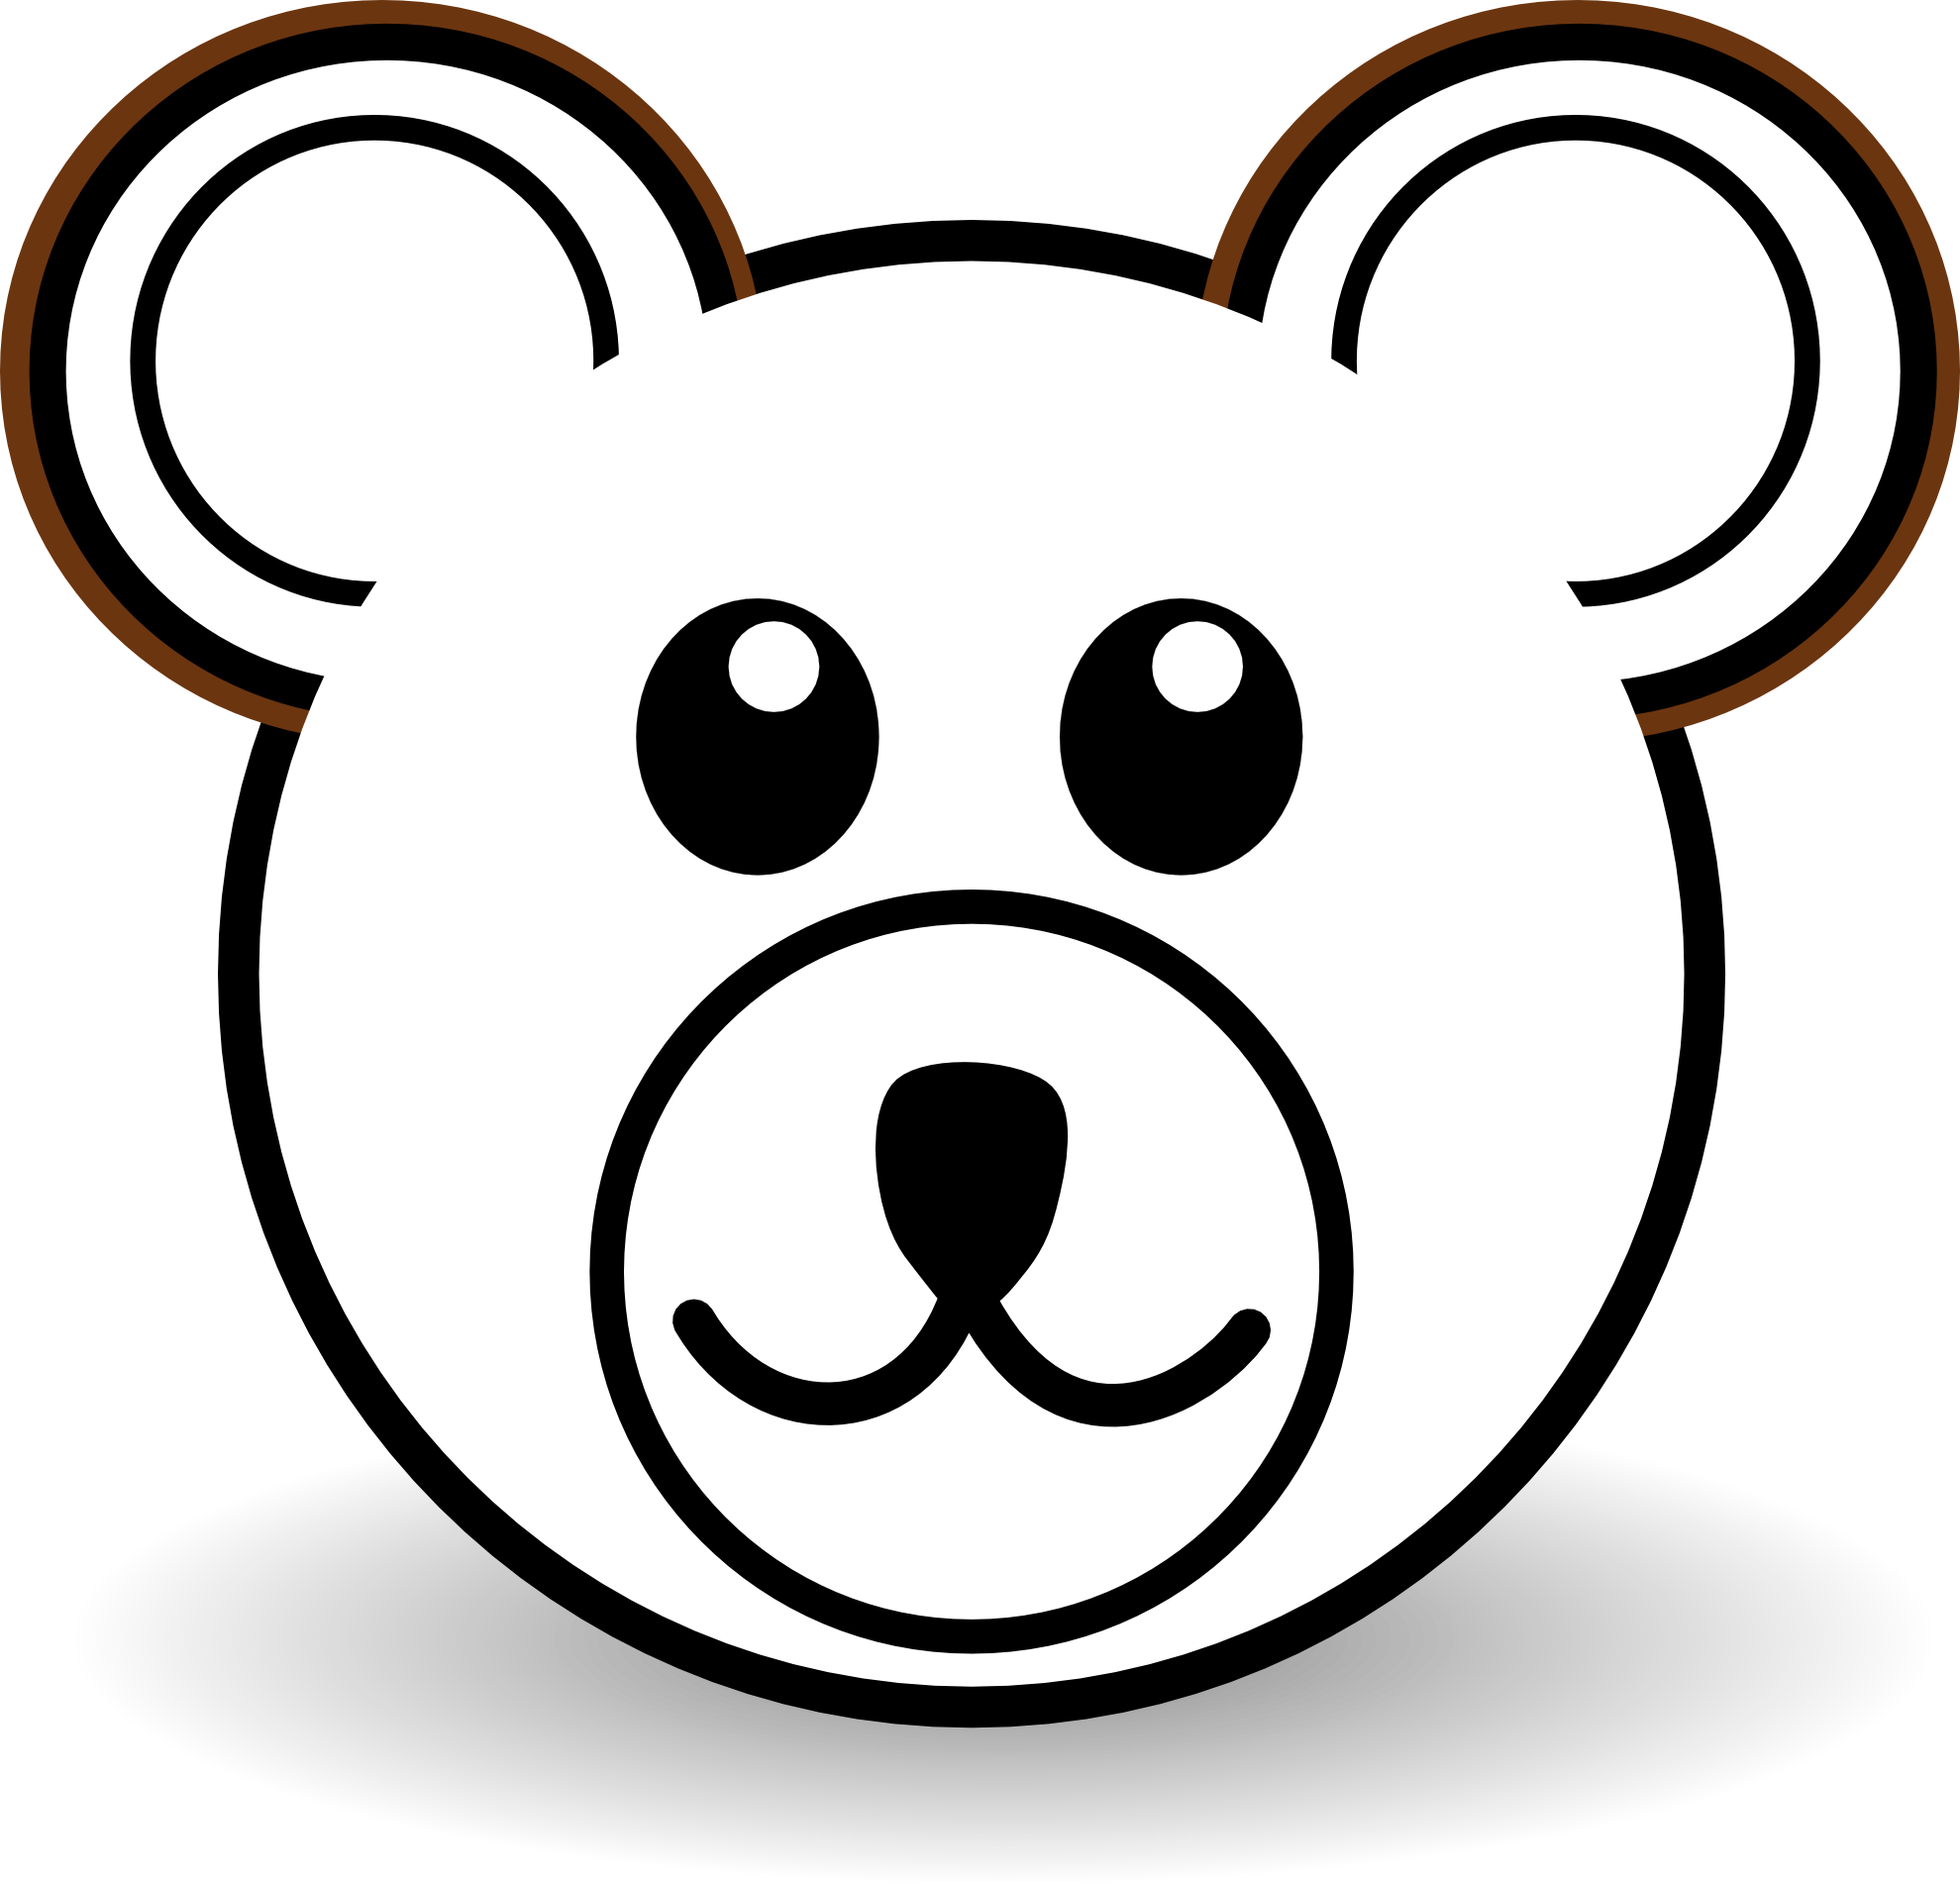 Ears clipart teddy bear. Outline panda free images